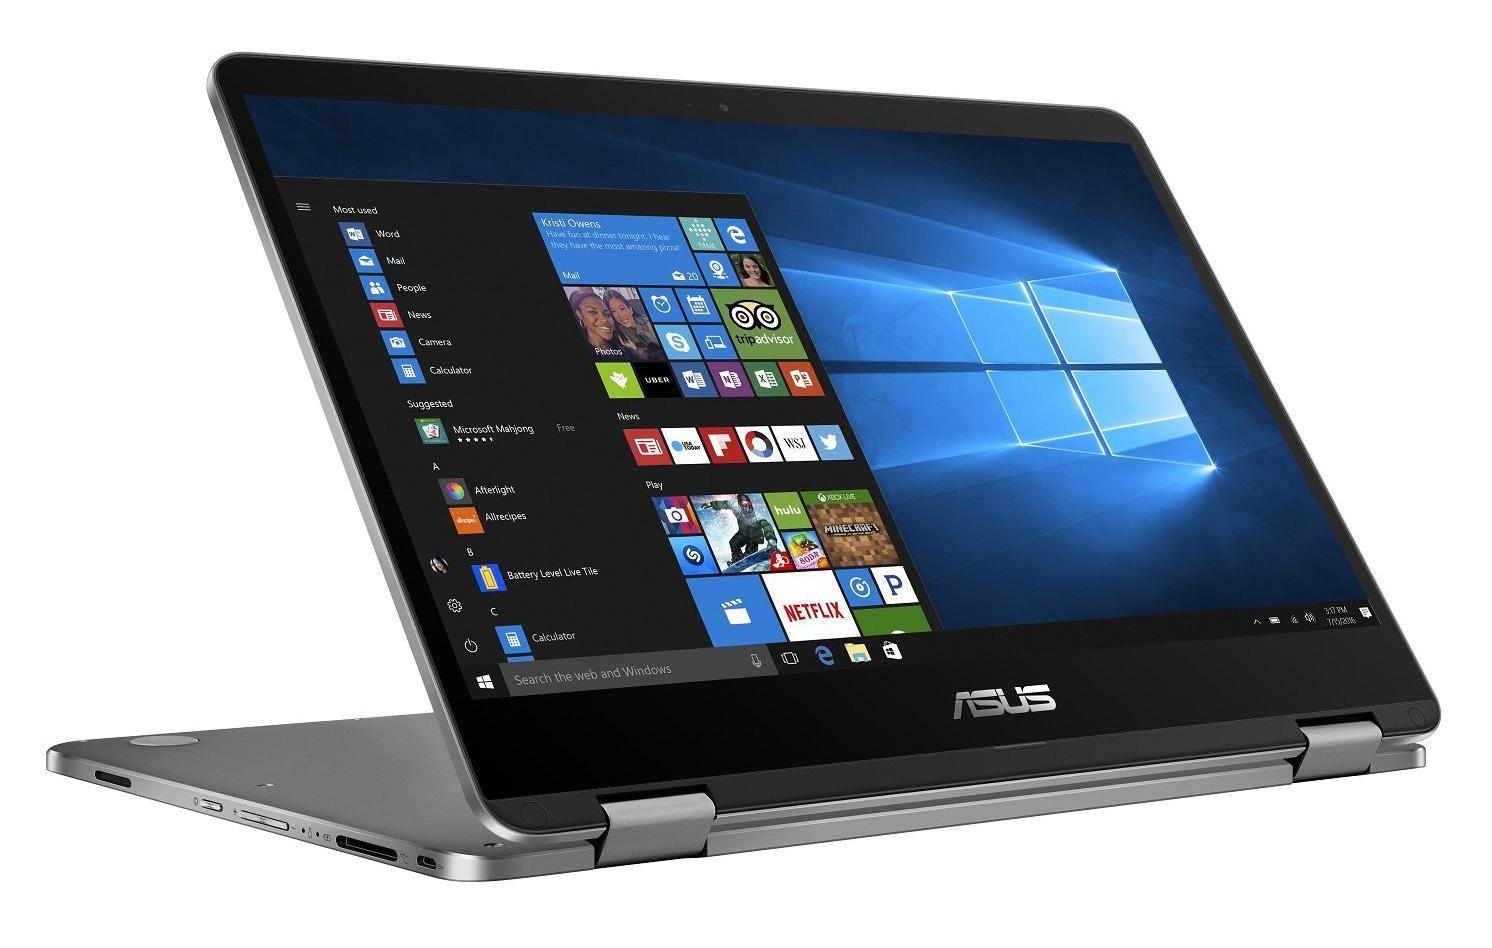 Image du PC portable Asus VivoBook Flip J401NA-BZ060TS tactile